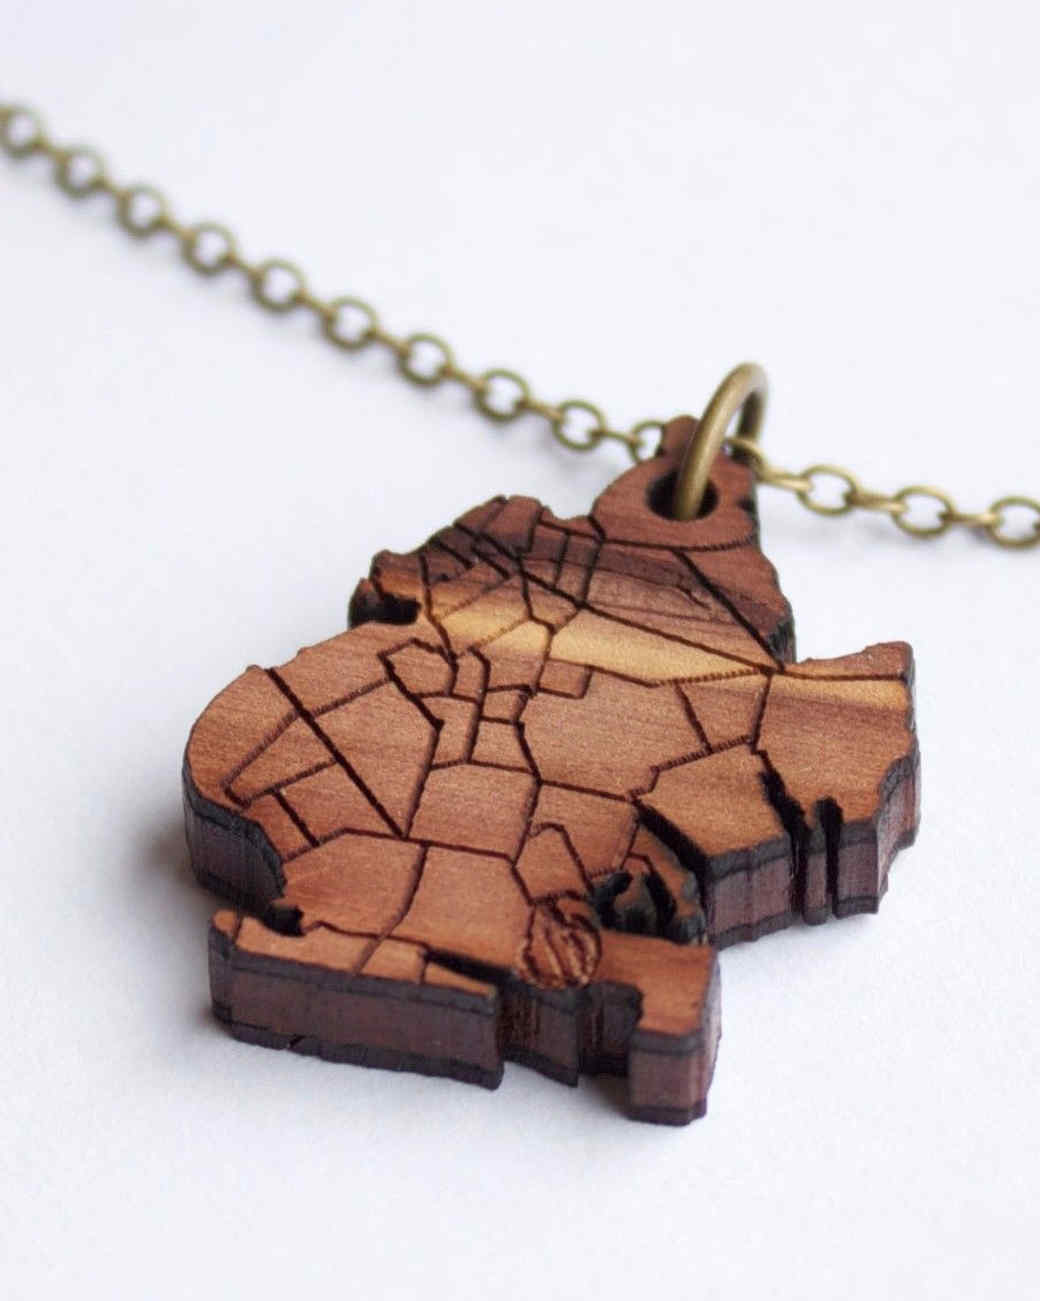 neighborwoods-brooklyn-necklace-1014.jpg